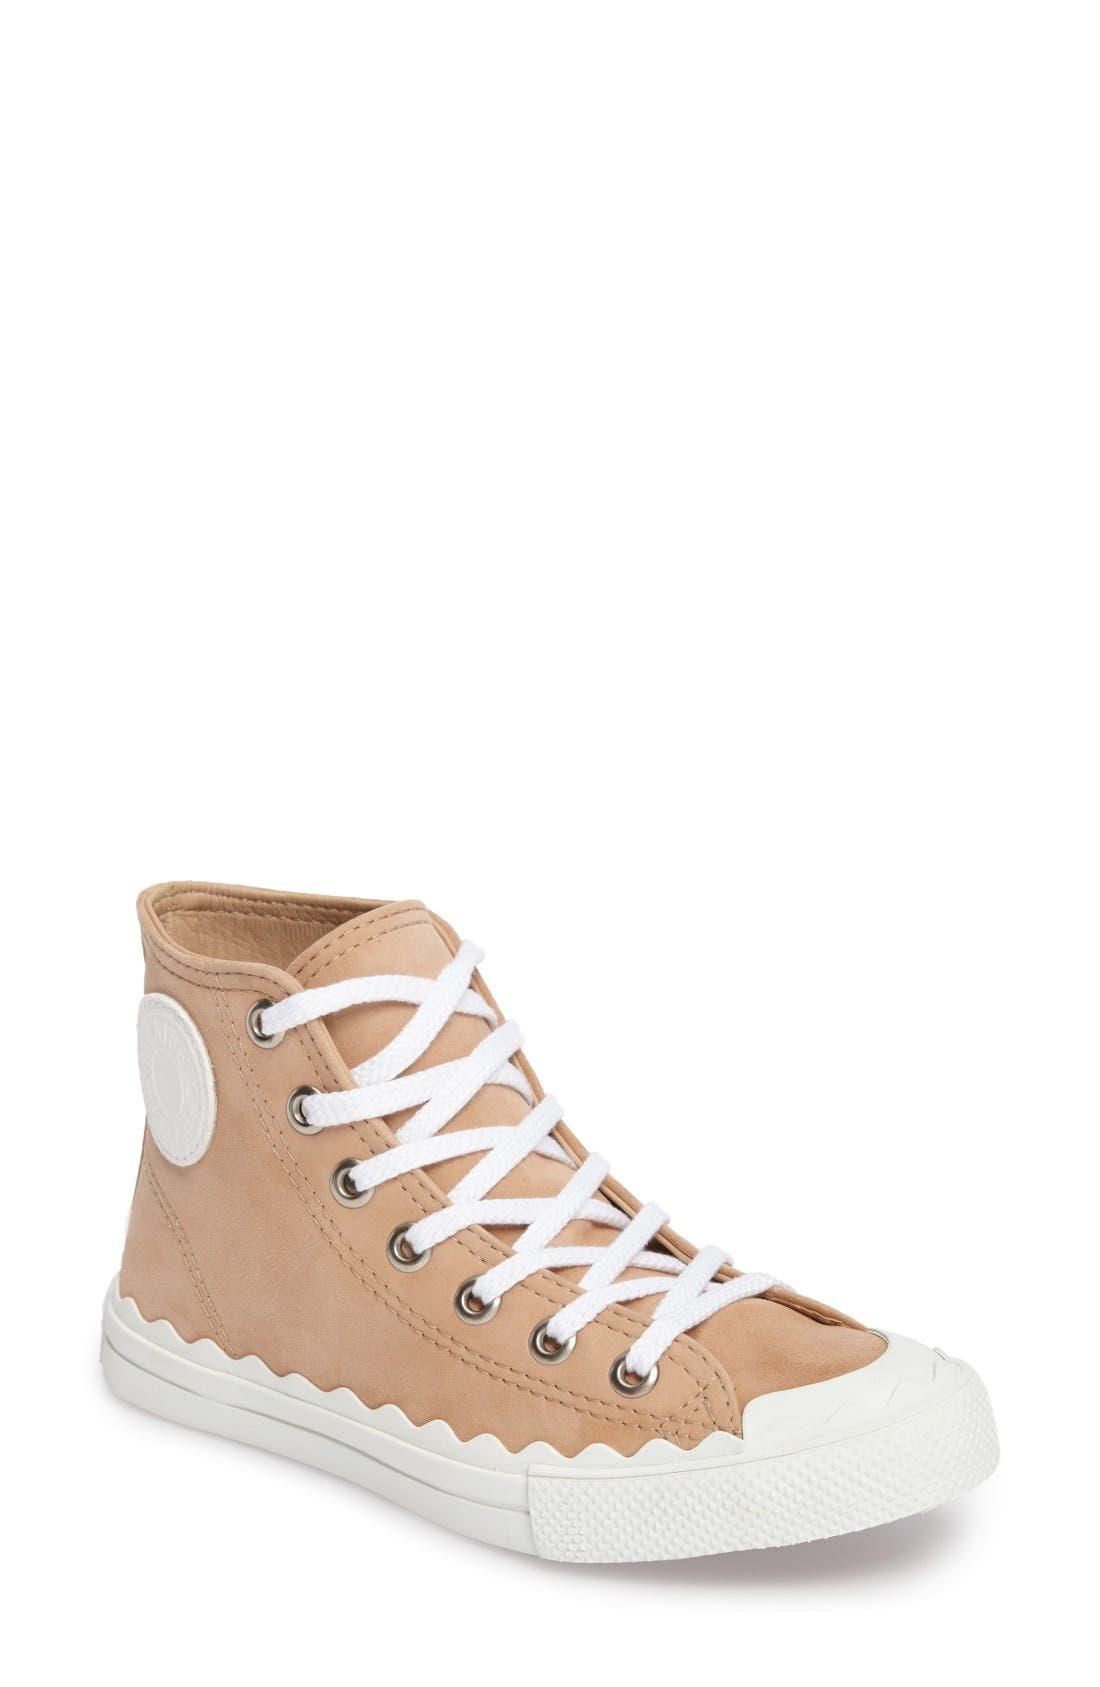 CHLOÉ Kyle Mid Top Sneaker